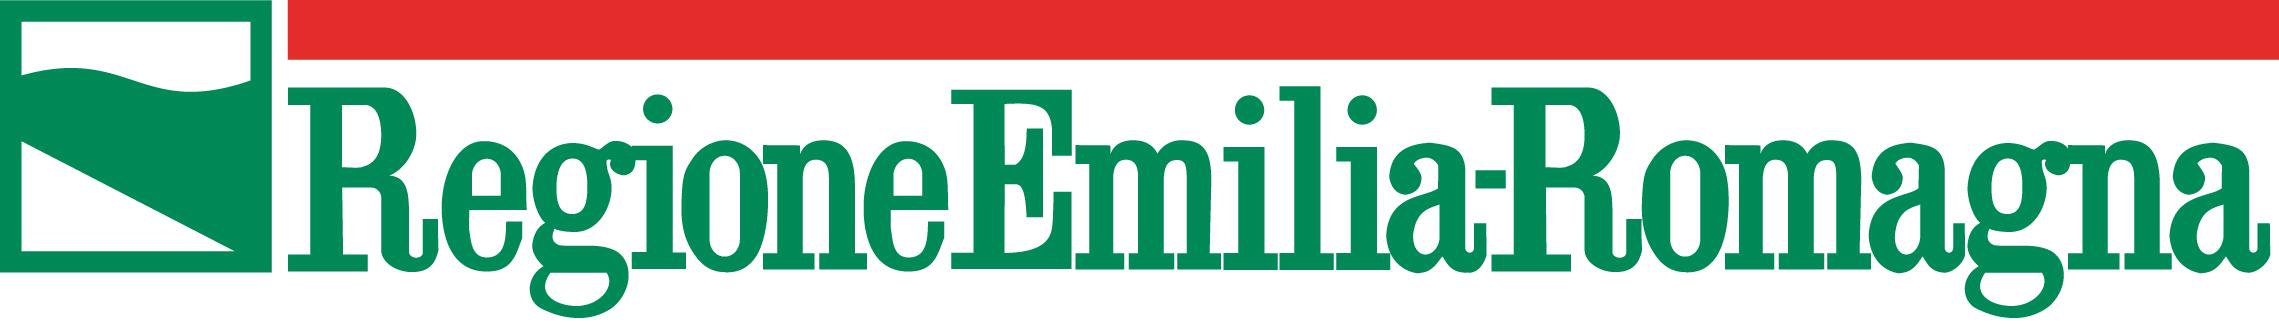 Logo orizzontale Regione Emilia-Romagna